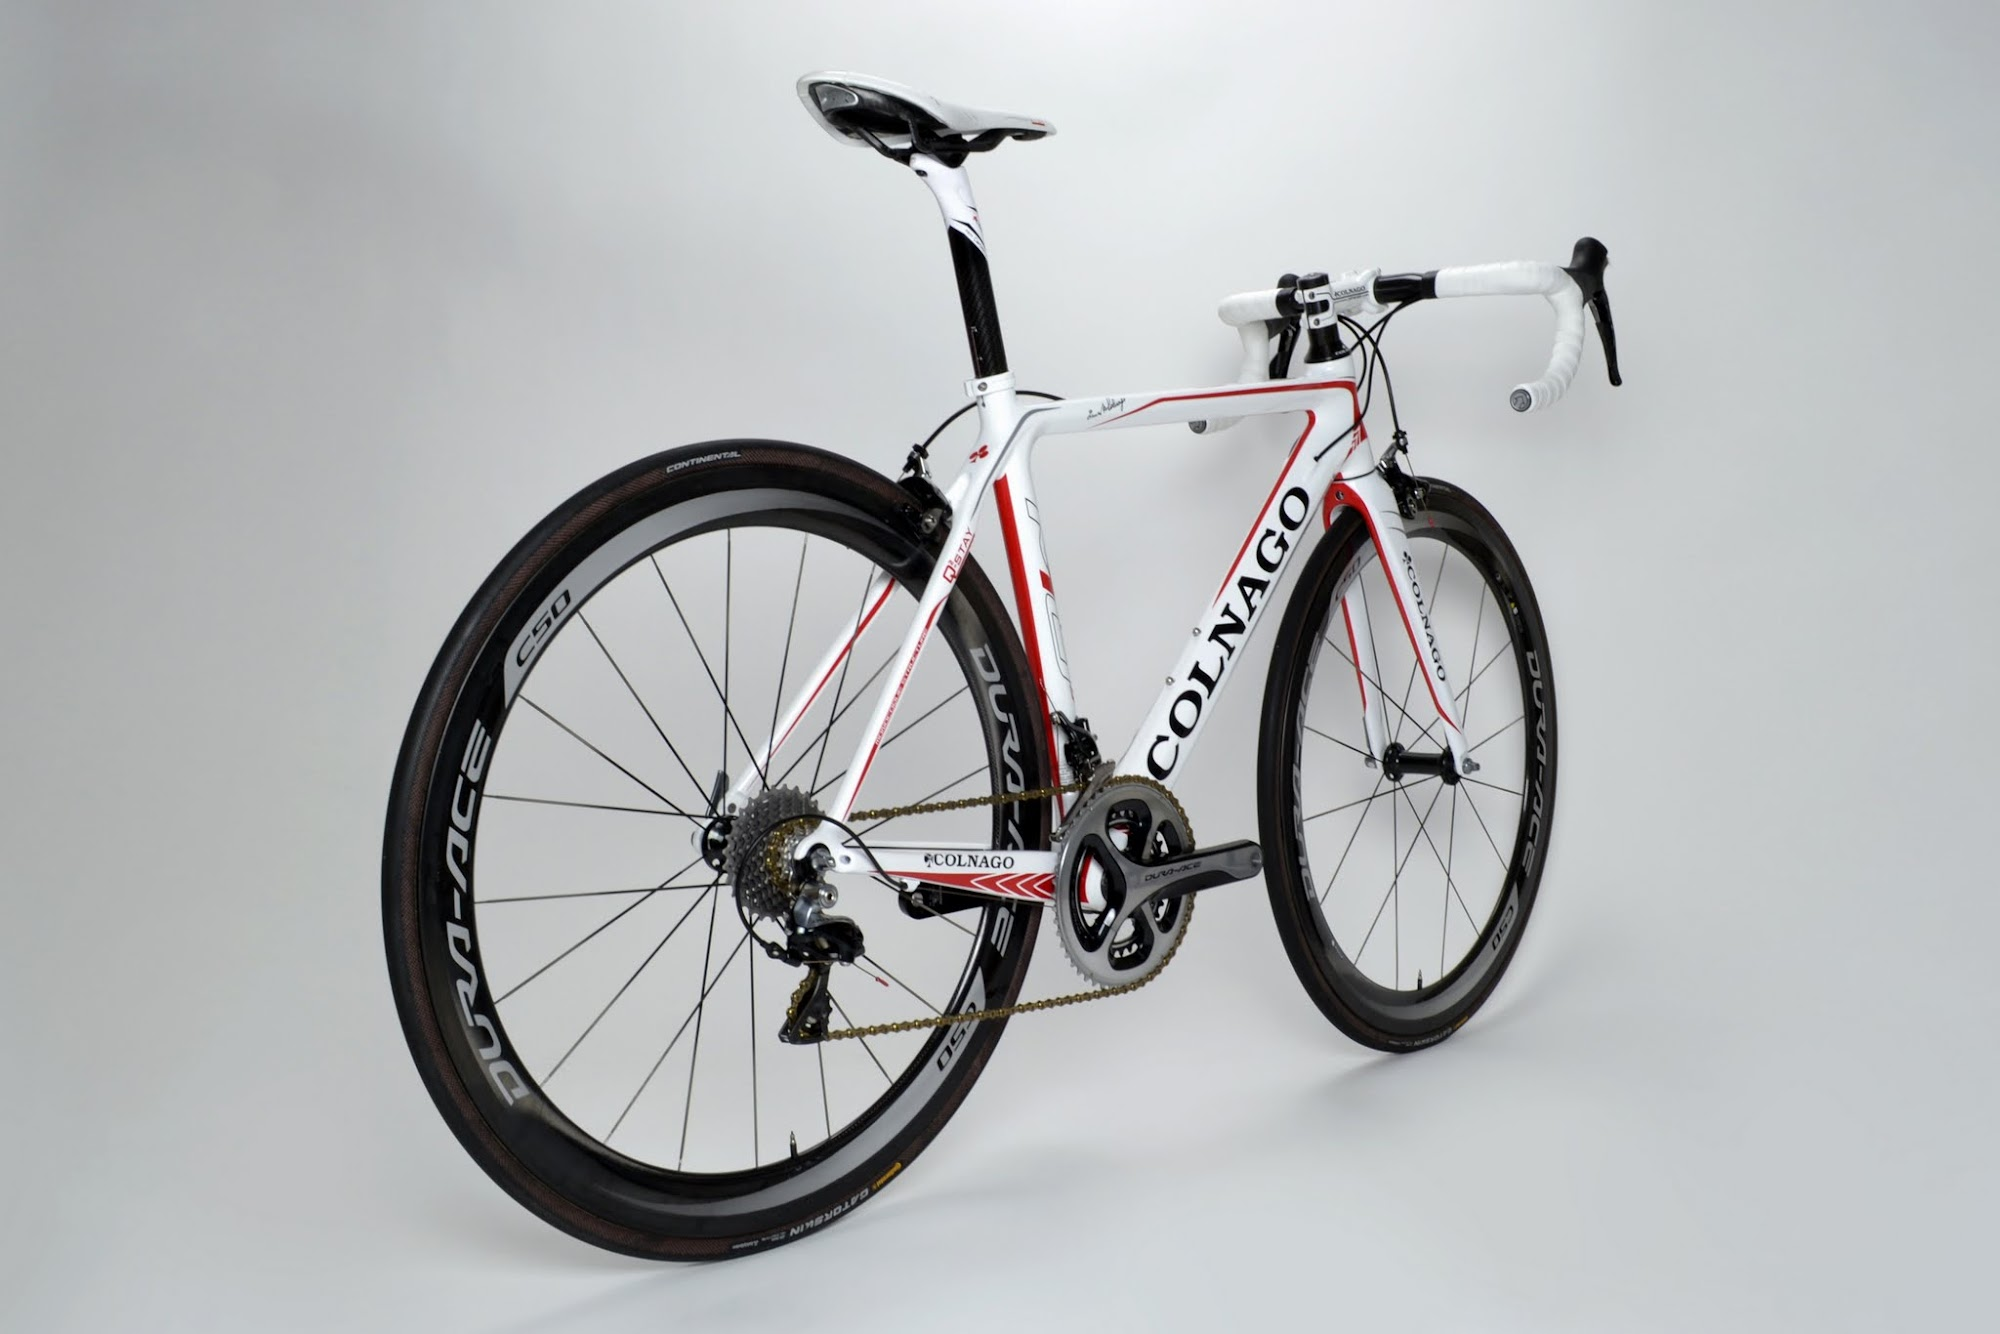 www.twohubs.com: Colnago M10 S Shimano Dura Ace 9000 Complete Bike at twohubs.com